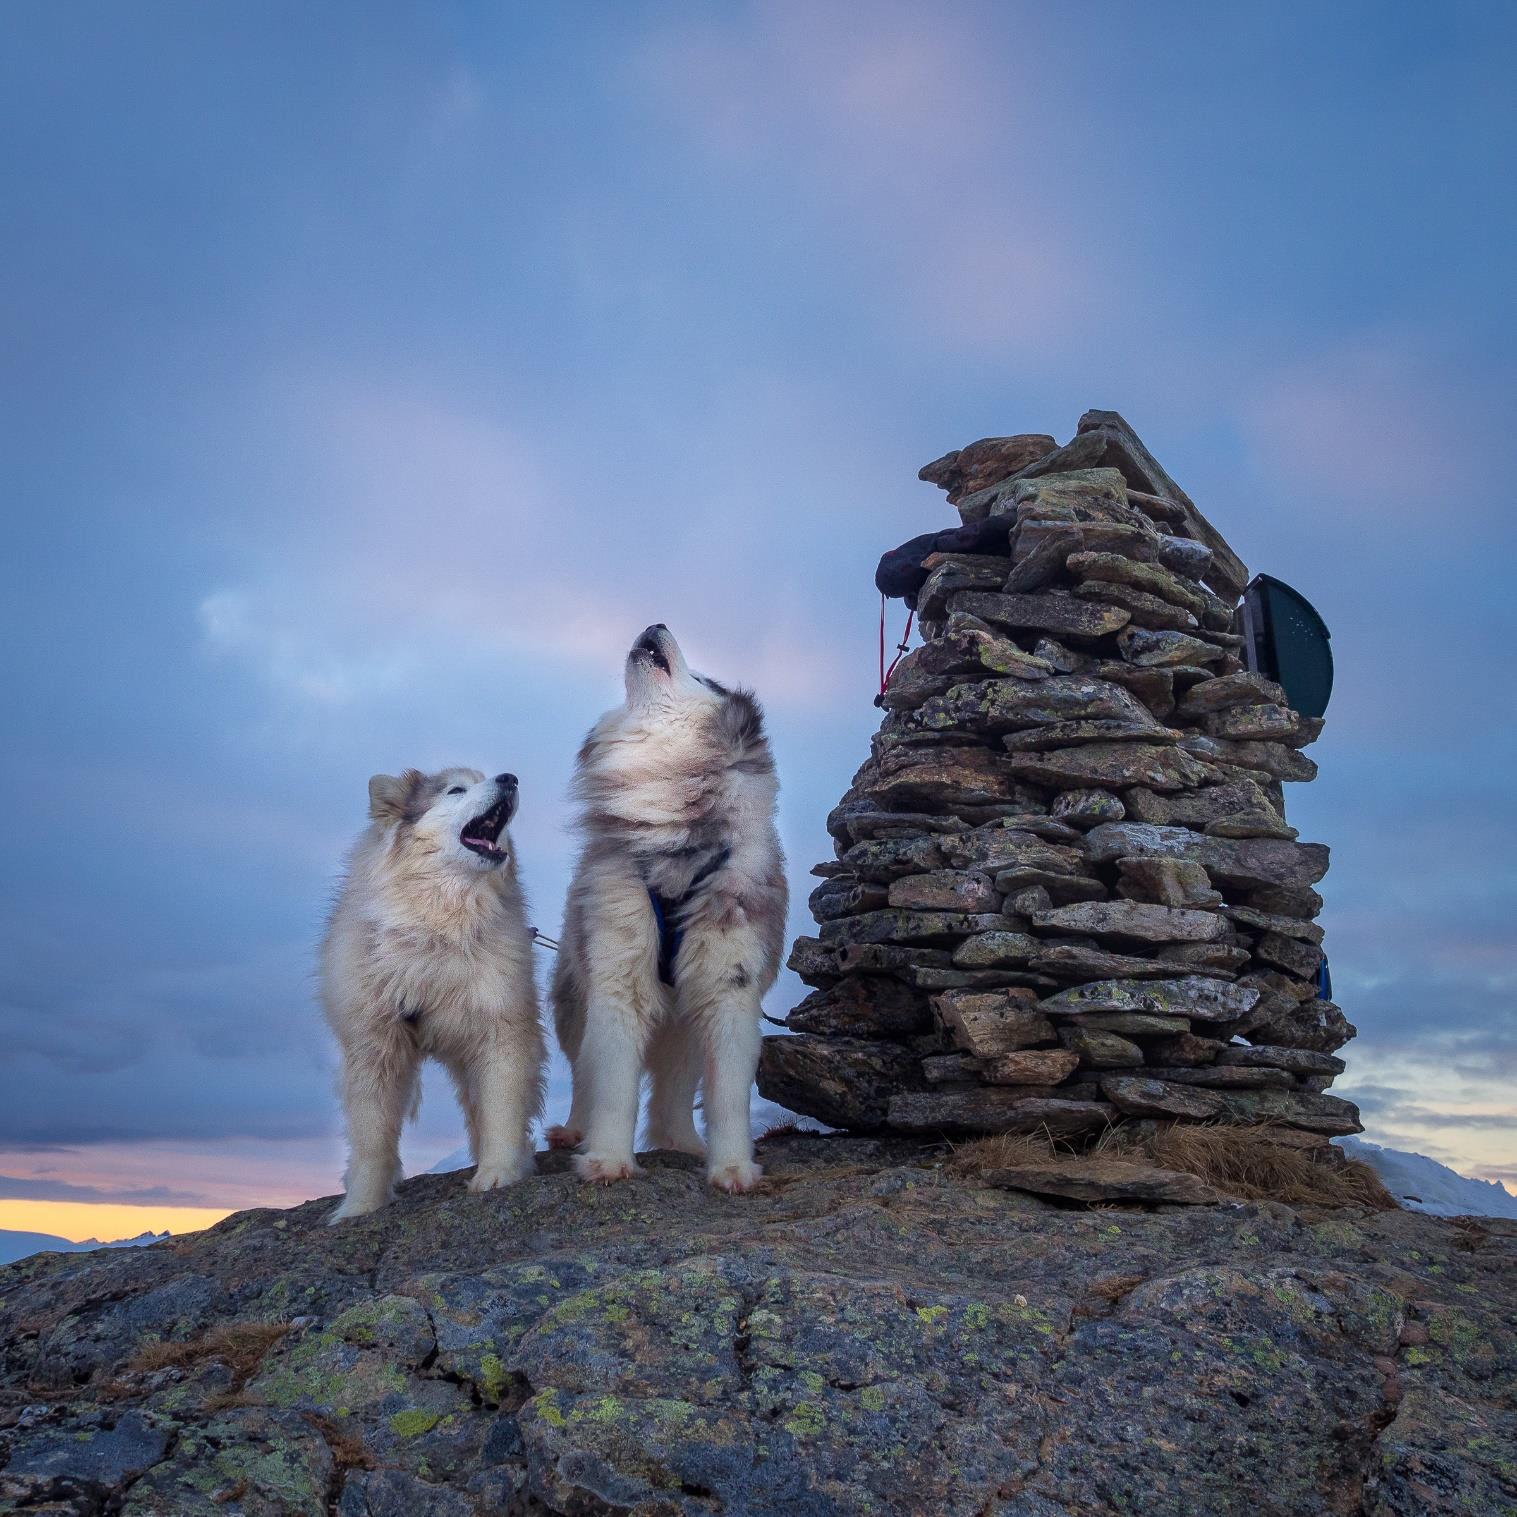 Veronika Sund, Harstad: Howling dogs